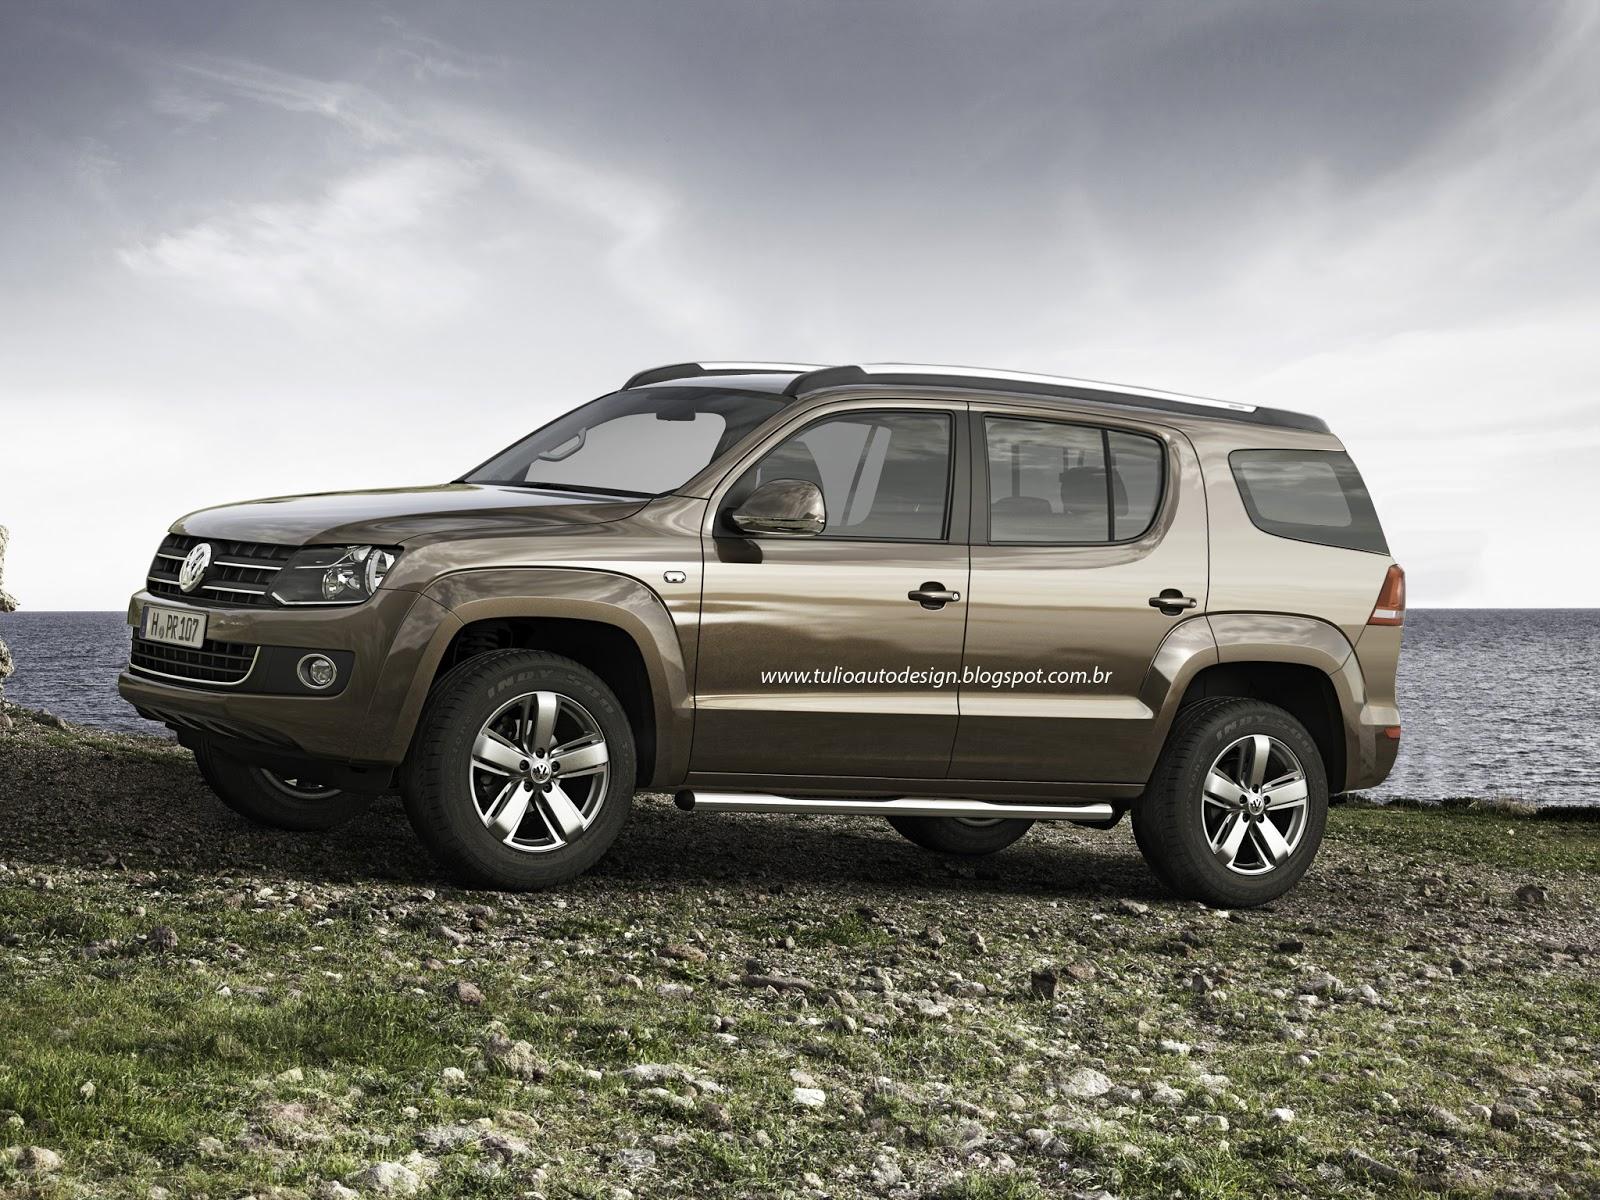 , Toyota Hilux SW4, Nissan Pathfinder e Mitsubishi Pajero Dakar